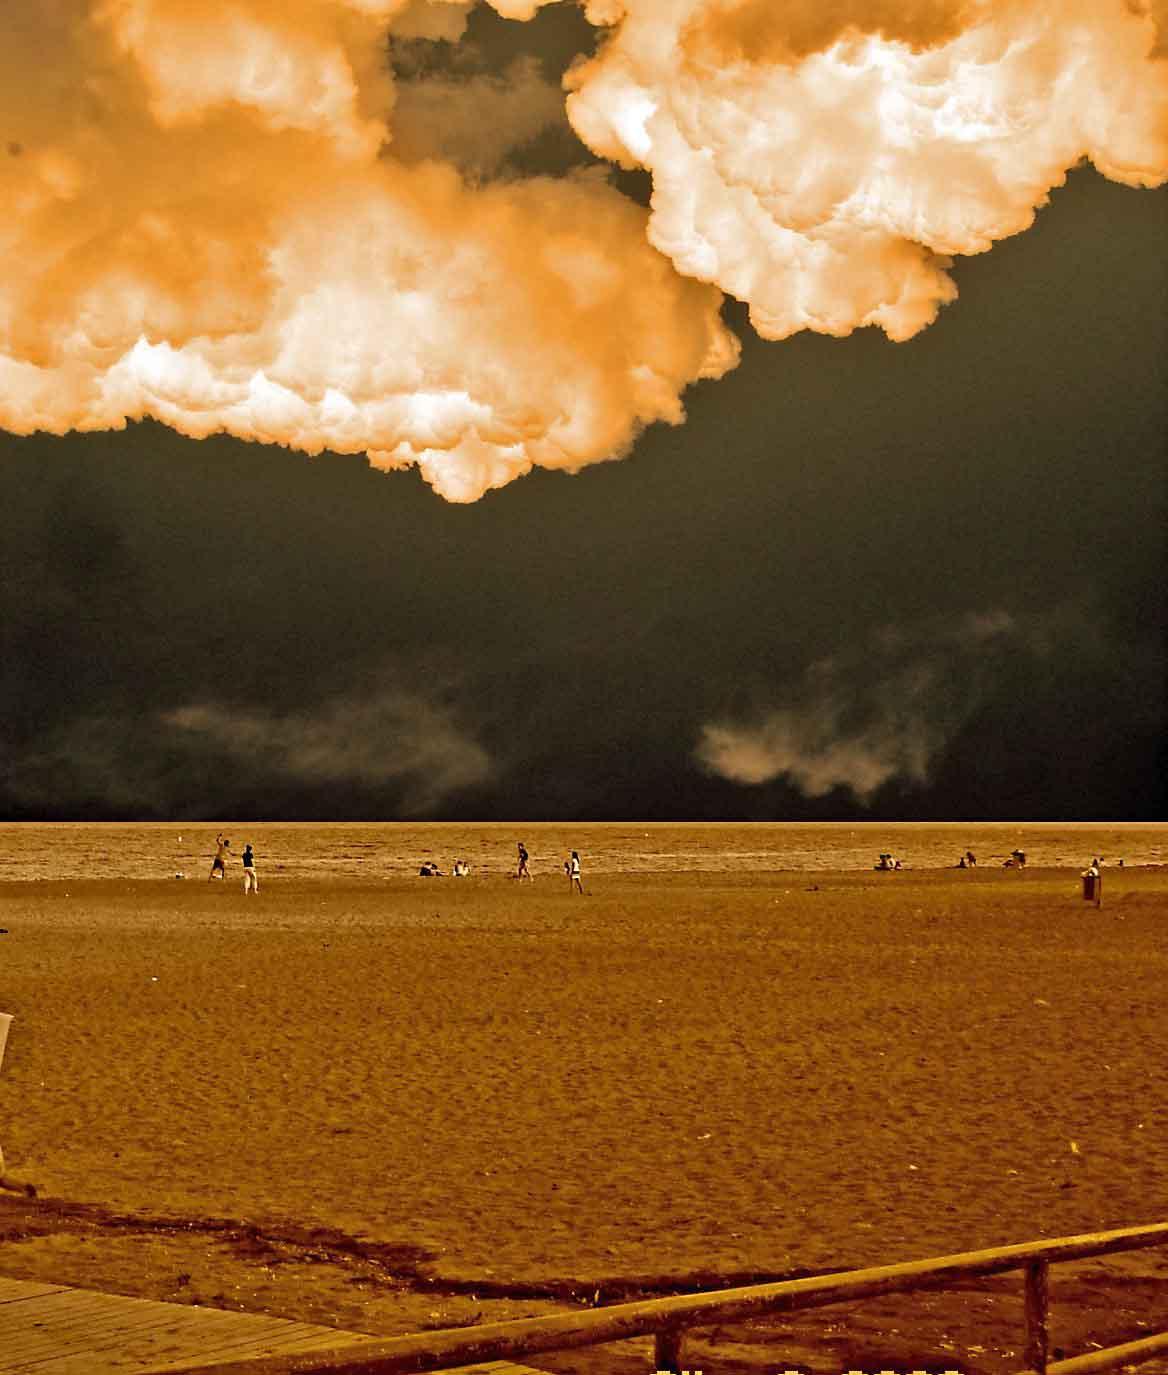 Foto playa El Candado. Tormenta